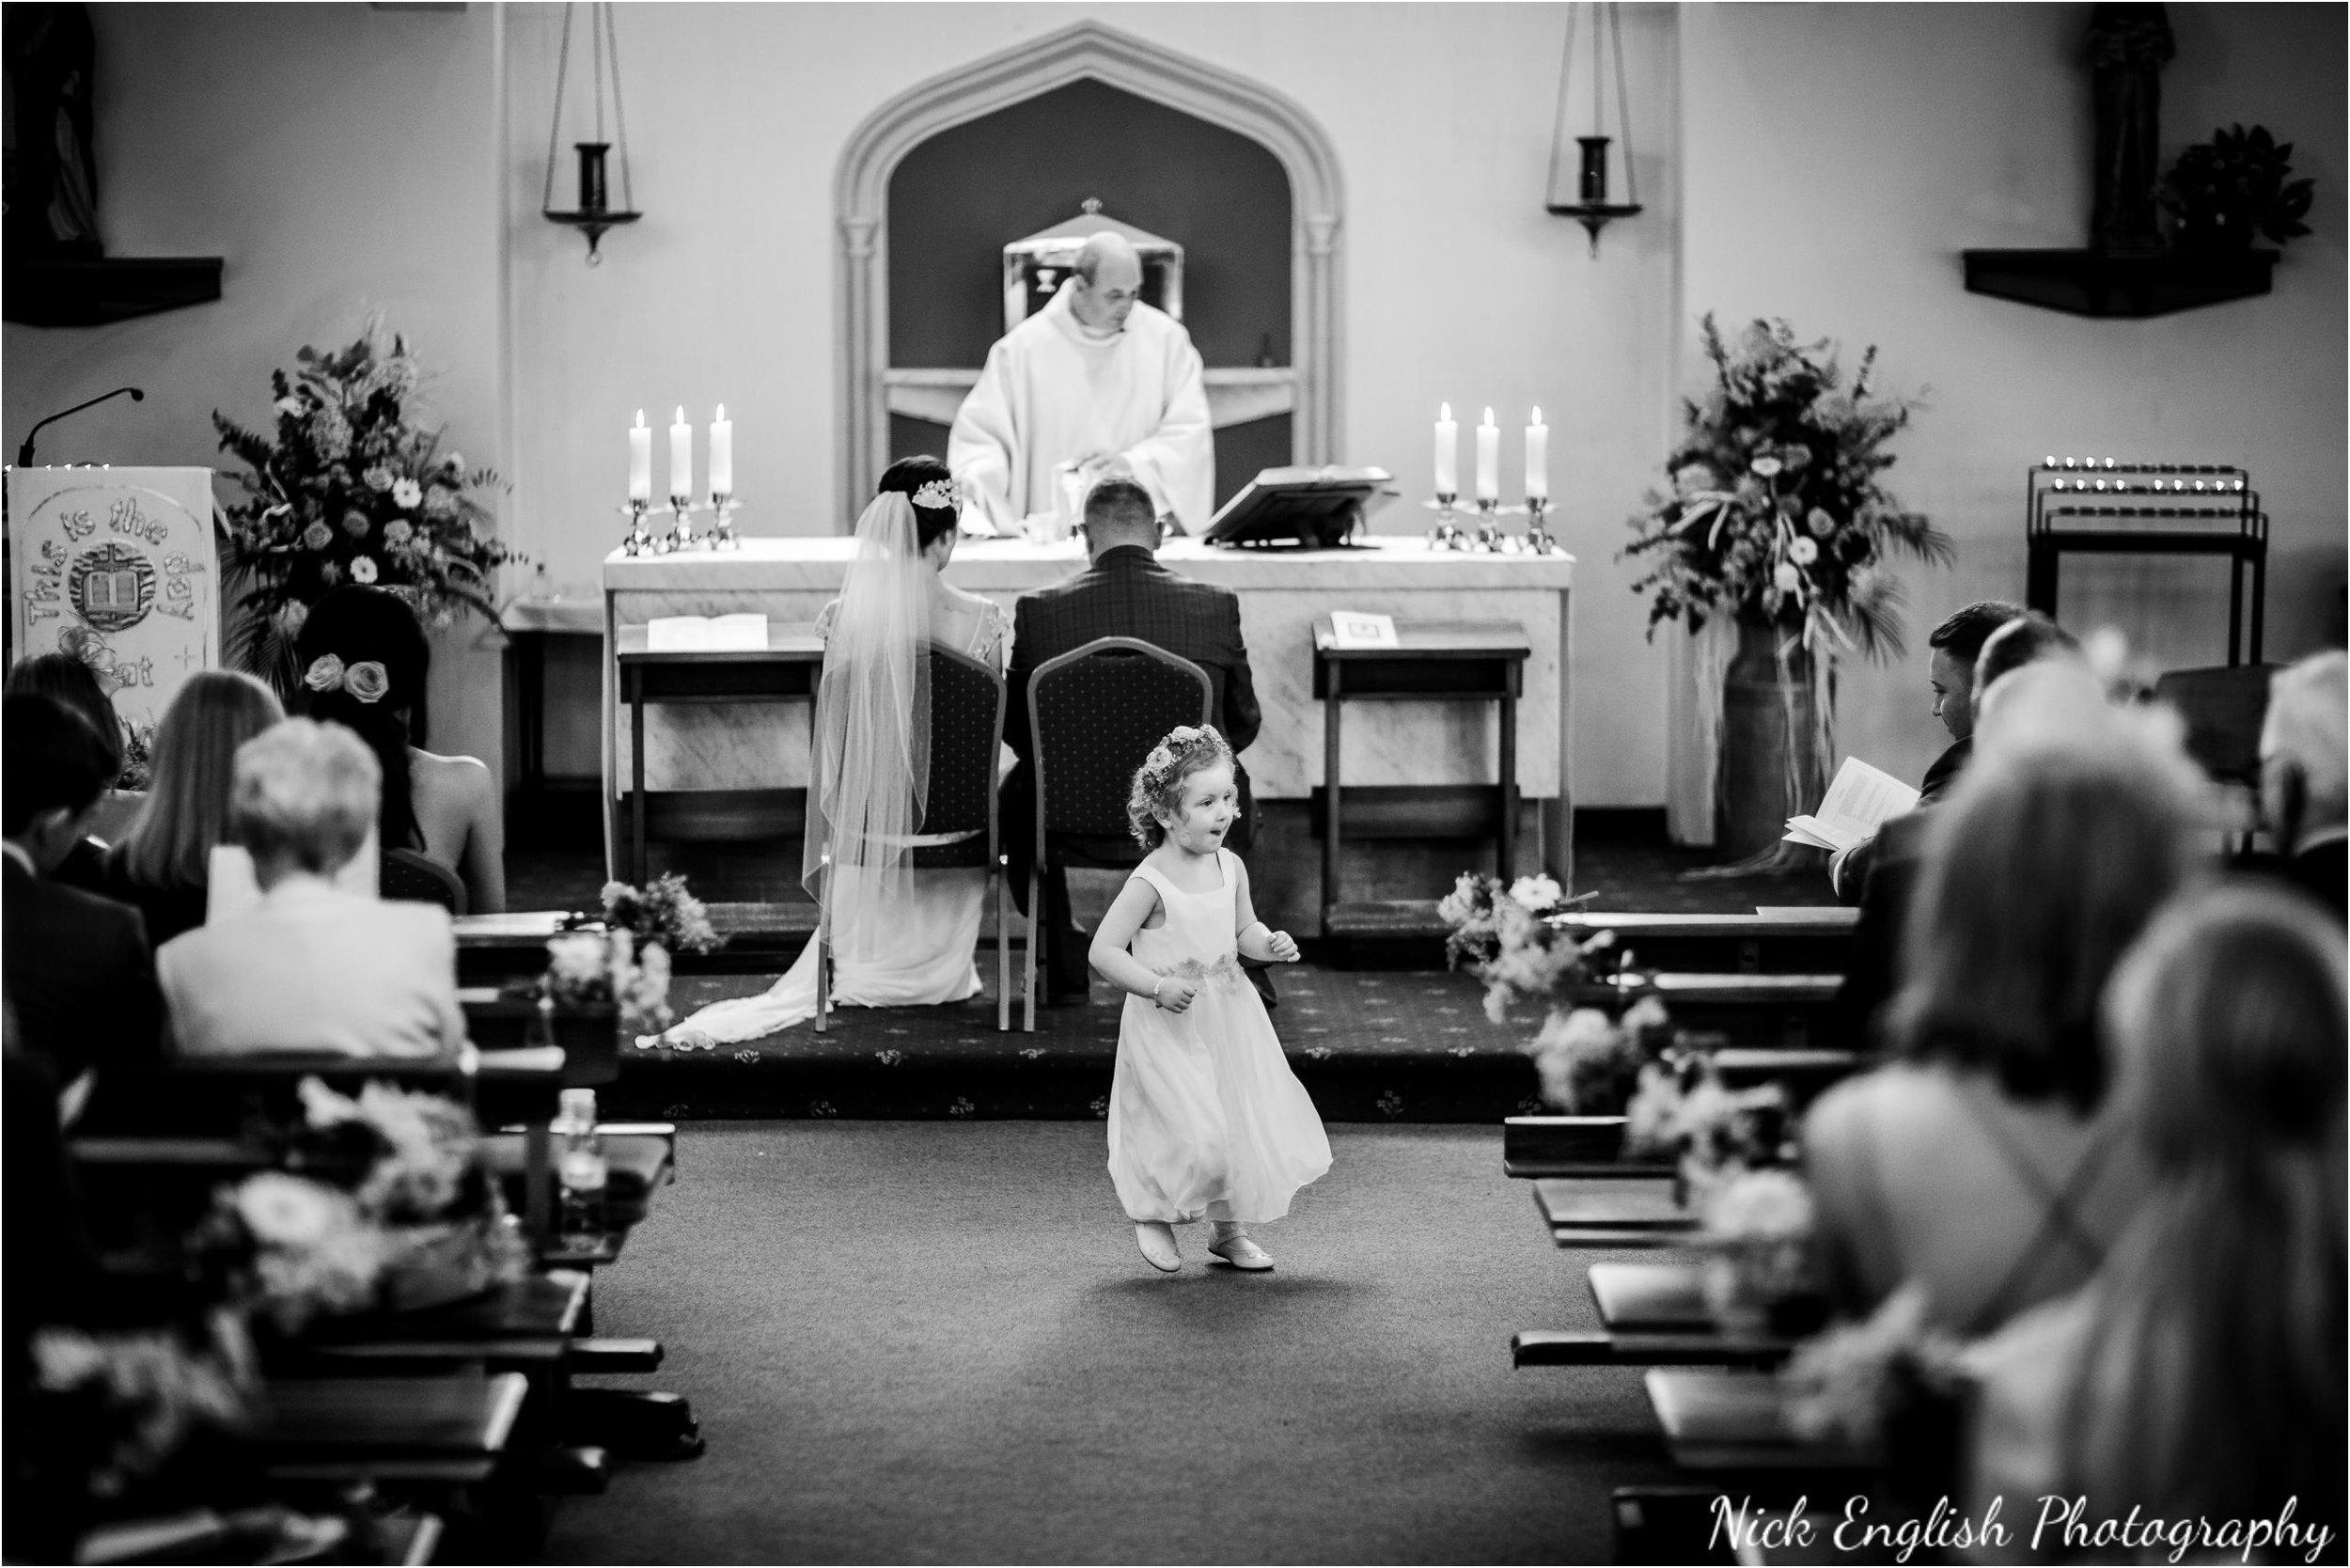 Stacey-Ash-Wedding-Photographs-Stanley-House-Preston-Lancashire-78.jpg